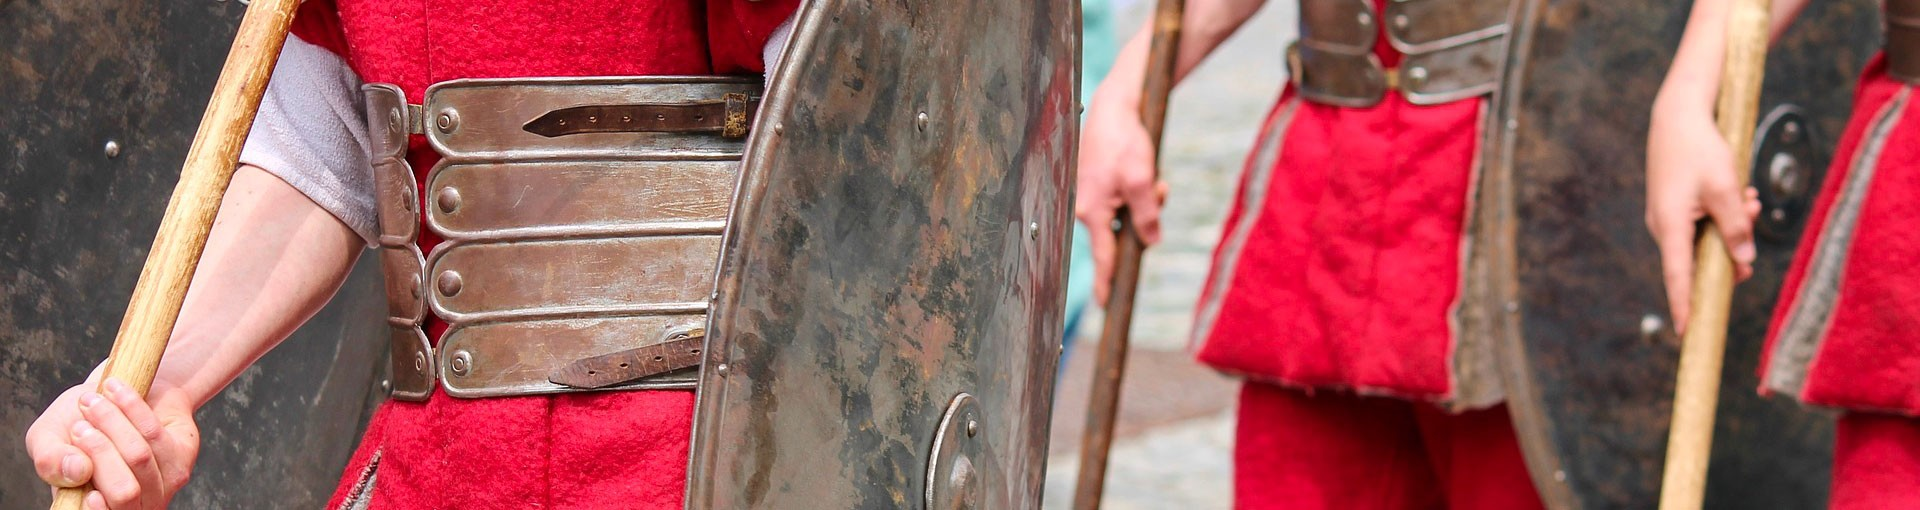 Tour Guidato Rimini Soldato Romano